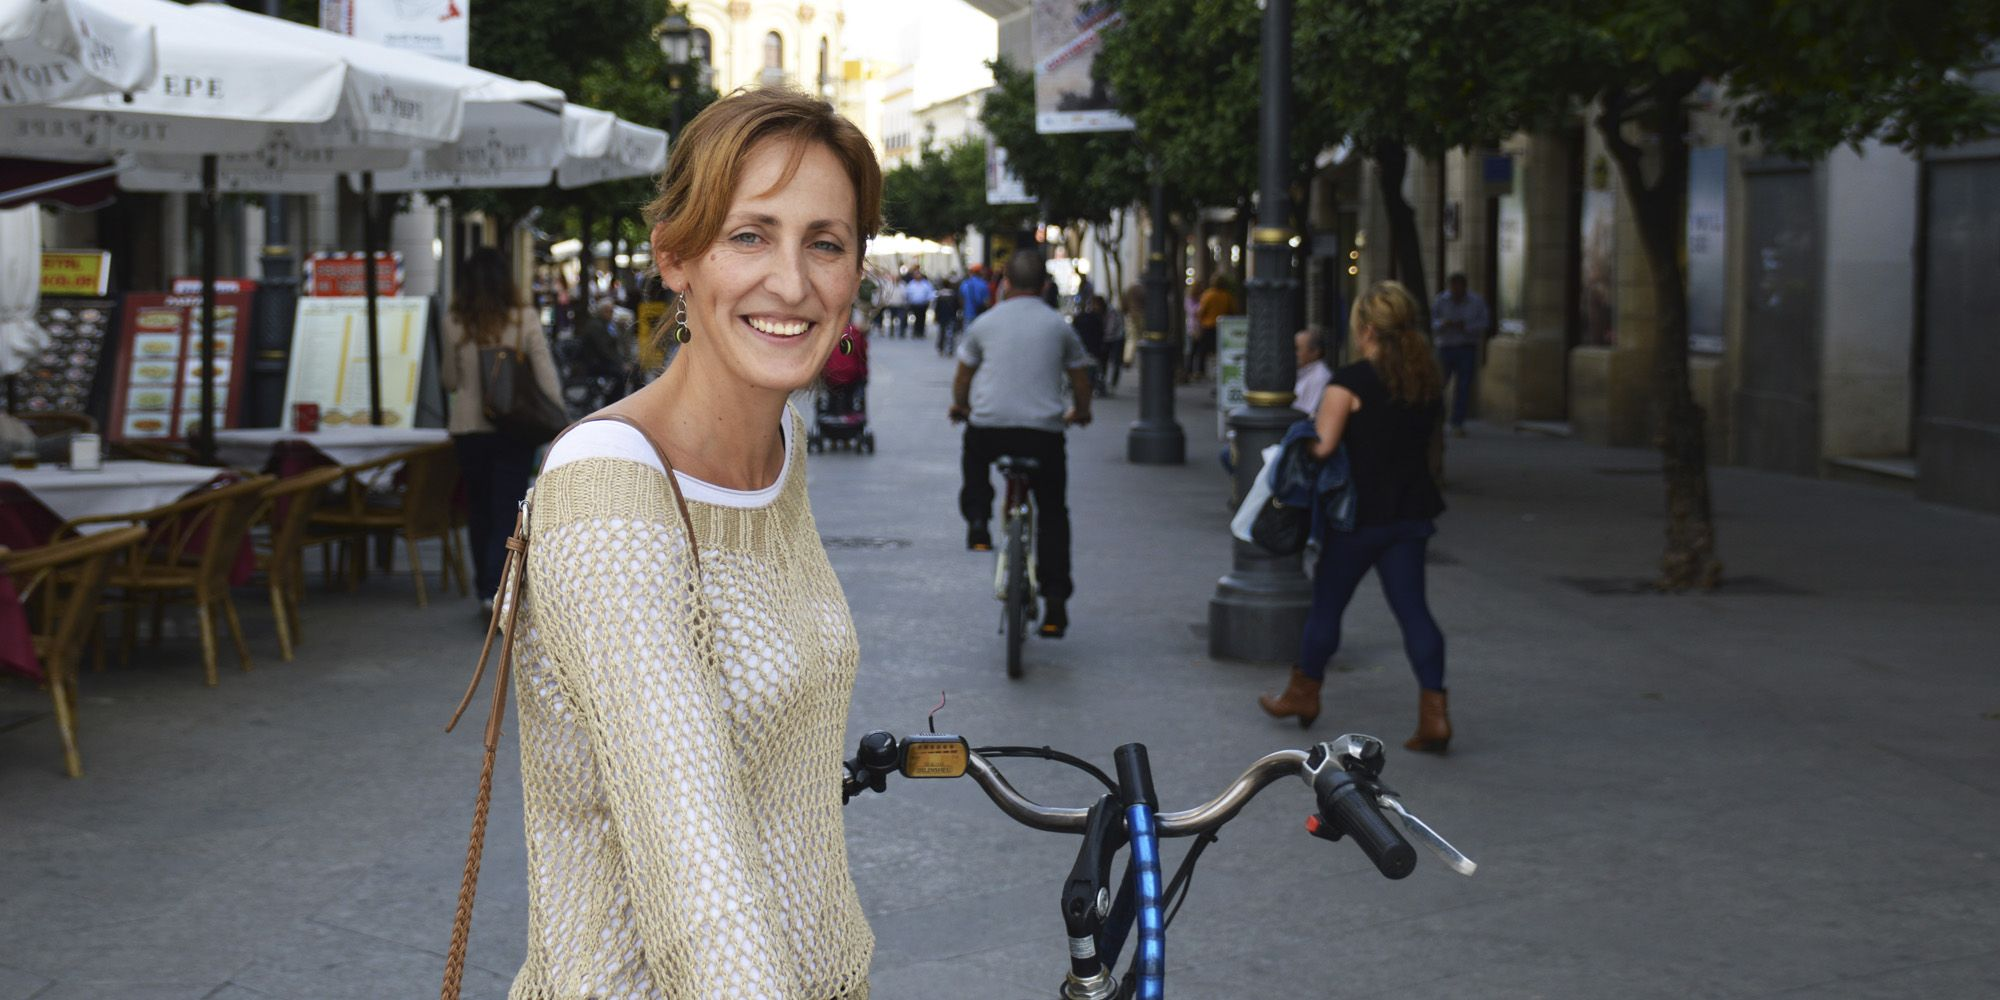 Ángeles González, conocida como Kika, concejal de Ganemos Jerez